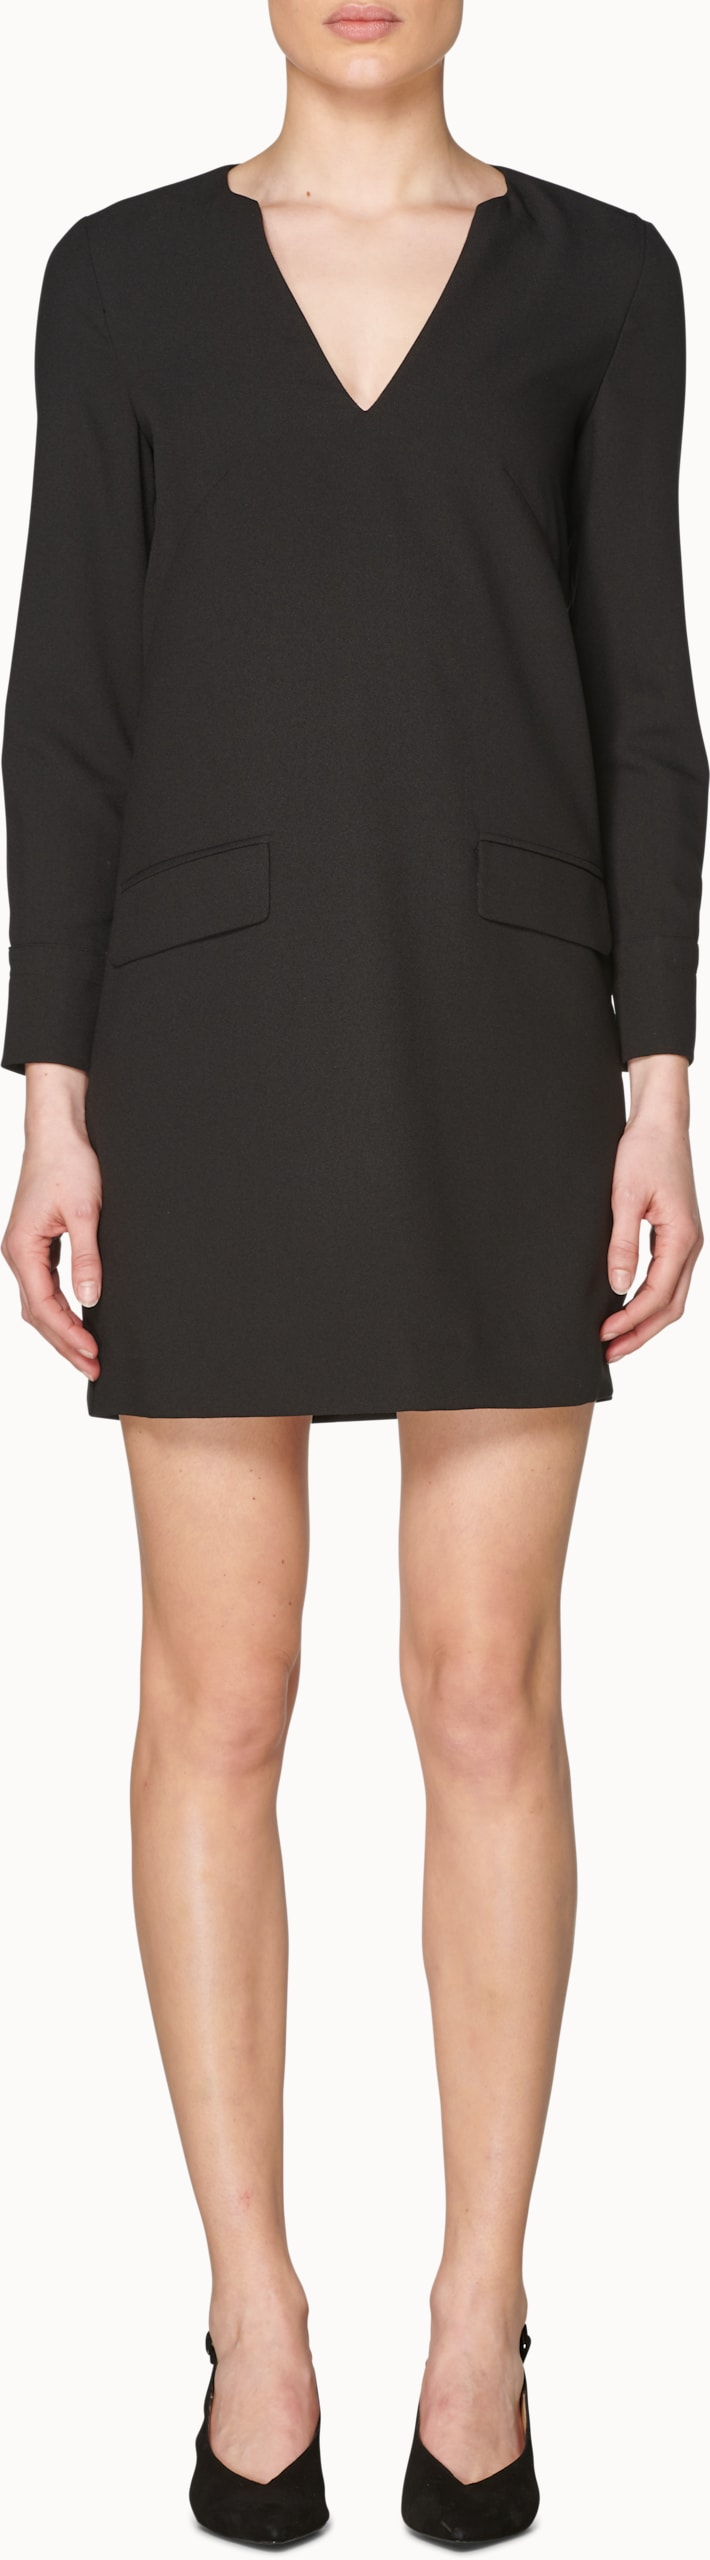 Aggy Black  Dress